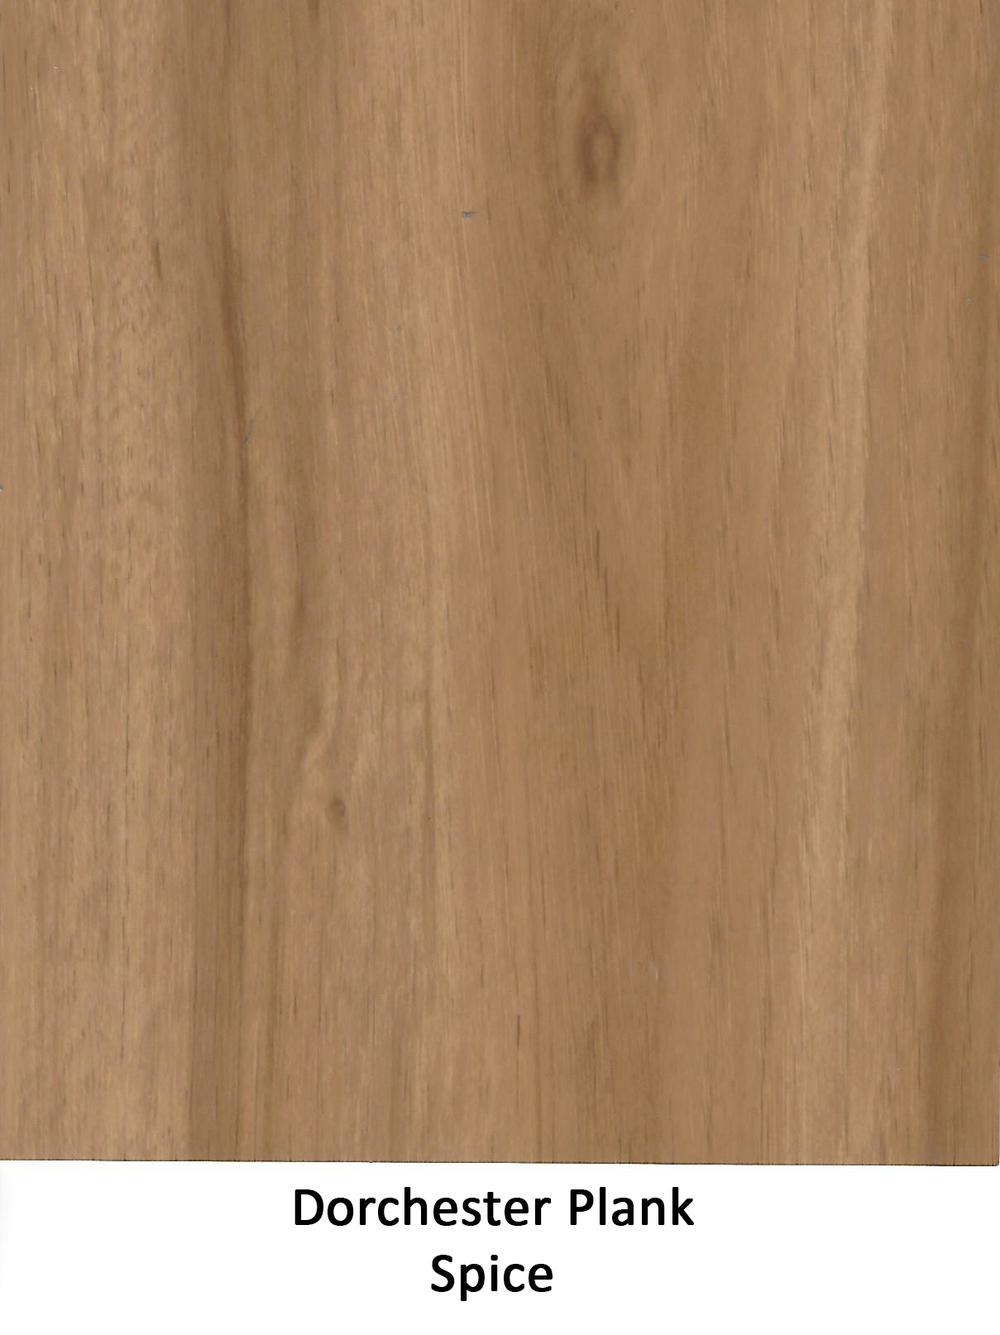 Dorchester-Plank---Spice.jpg